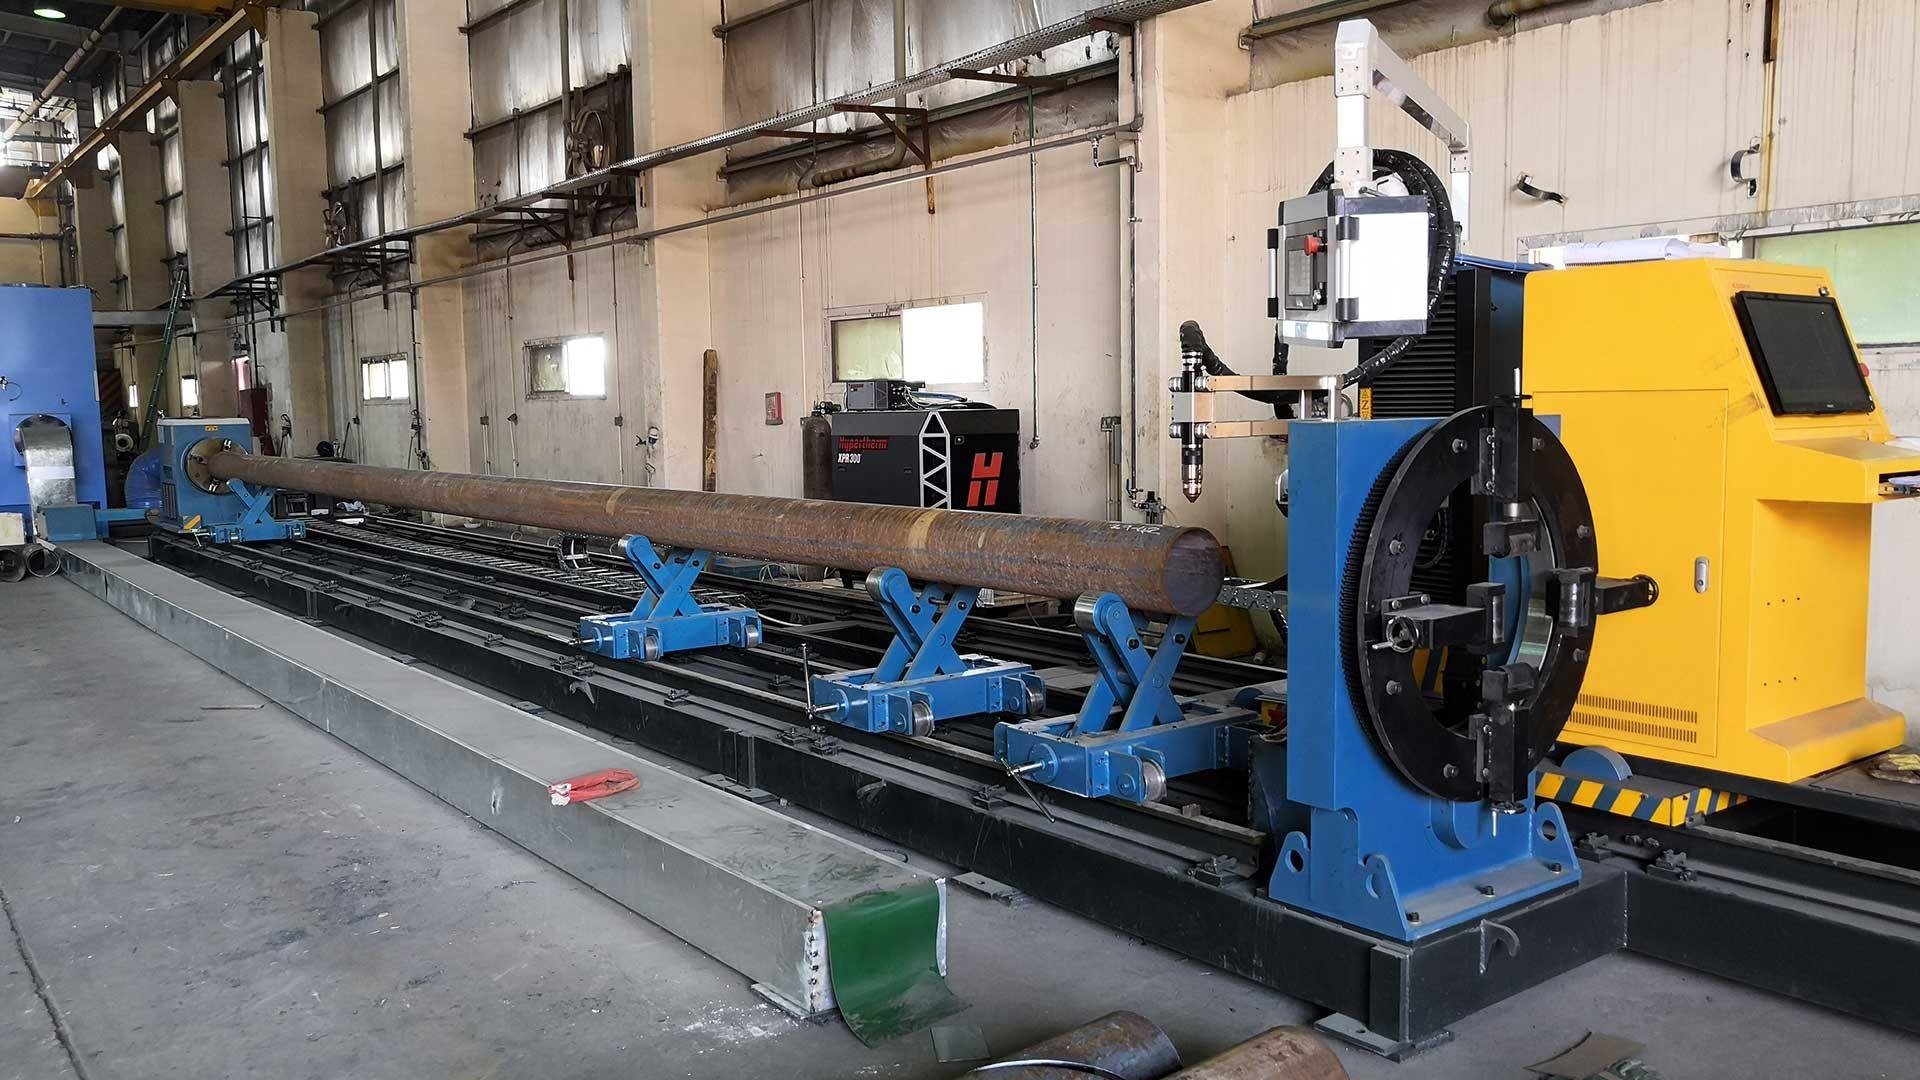 Pin On Steel Pipe Tube Cnc Plasma Cutting Machine